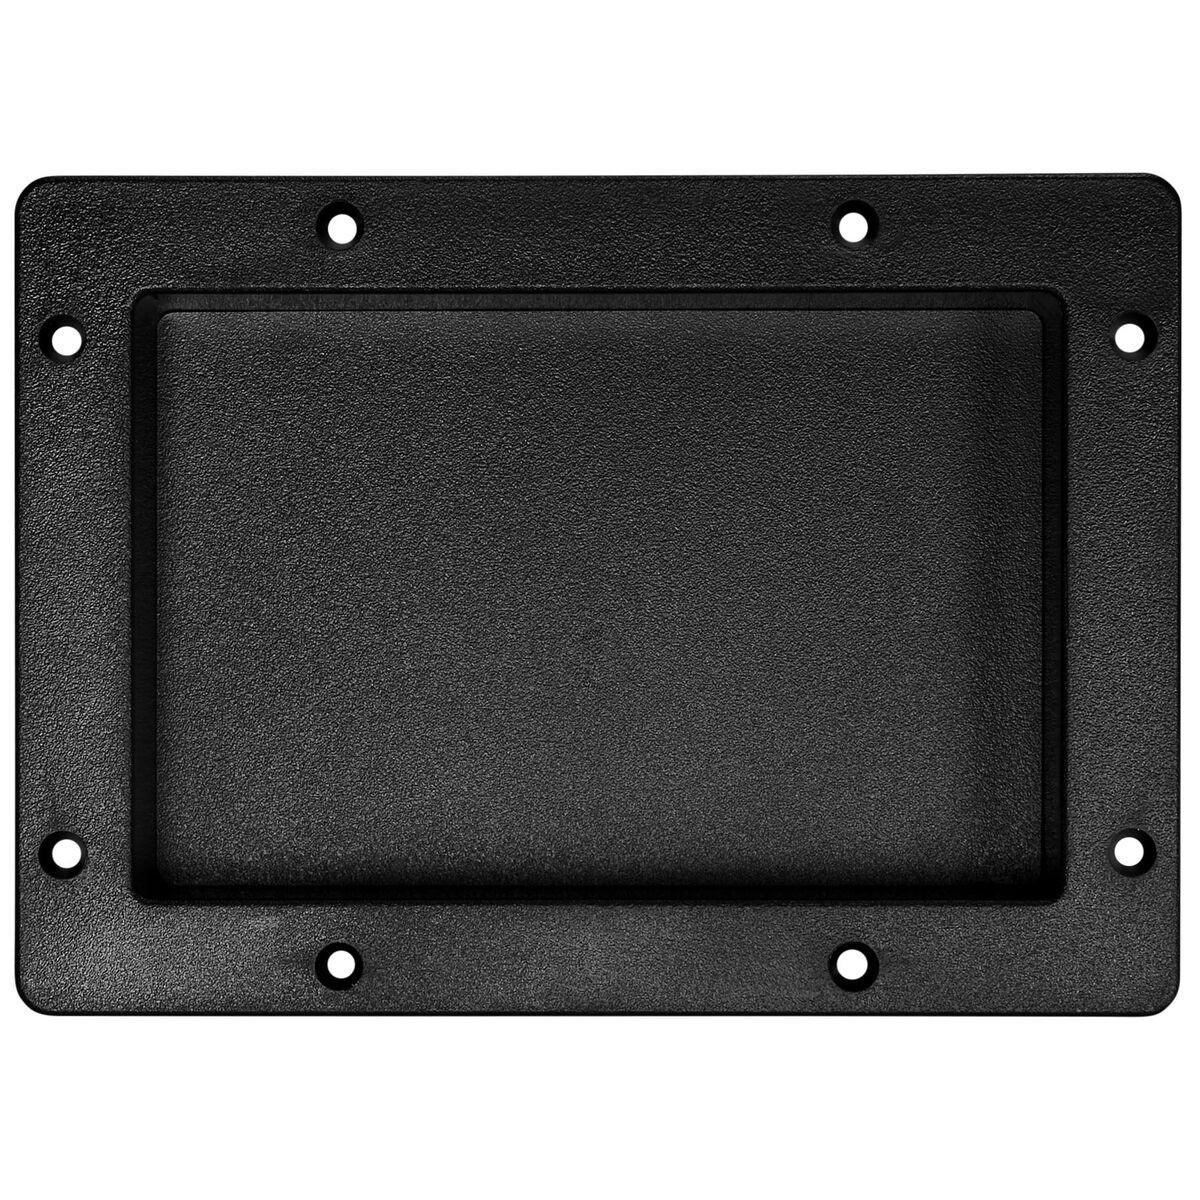 5 X 7 Speaker Input Terminal Plate Blank